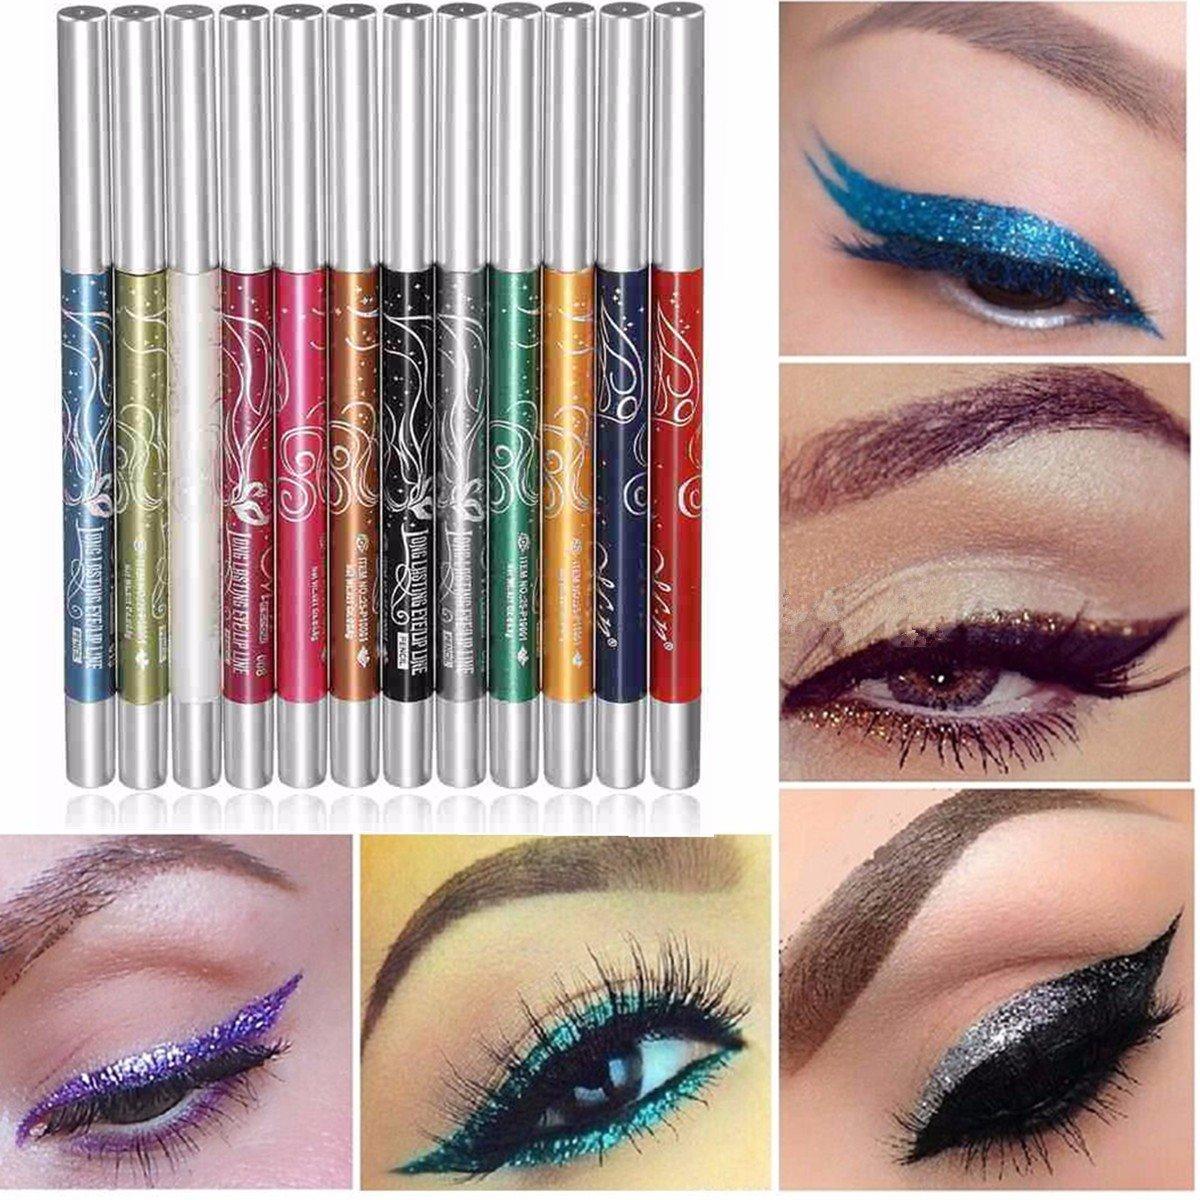 12 Colors Makeup Eye Shadow Eyeliner Lip Liner Pen Beauty Tool Set